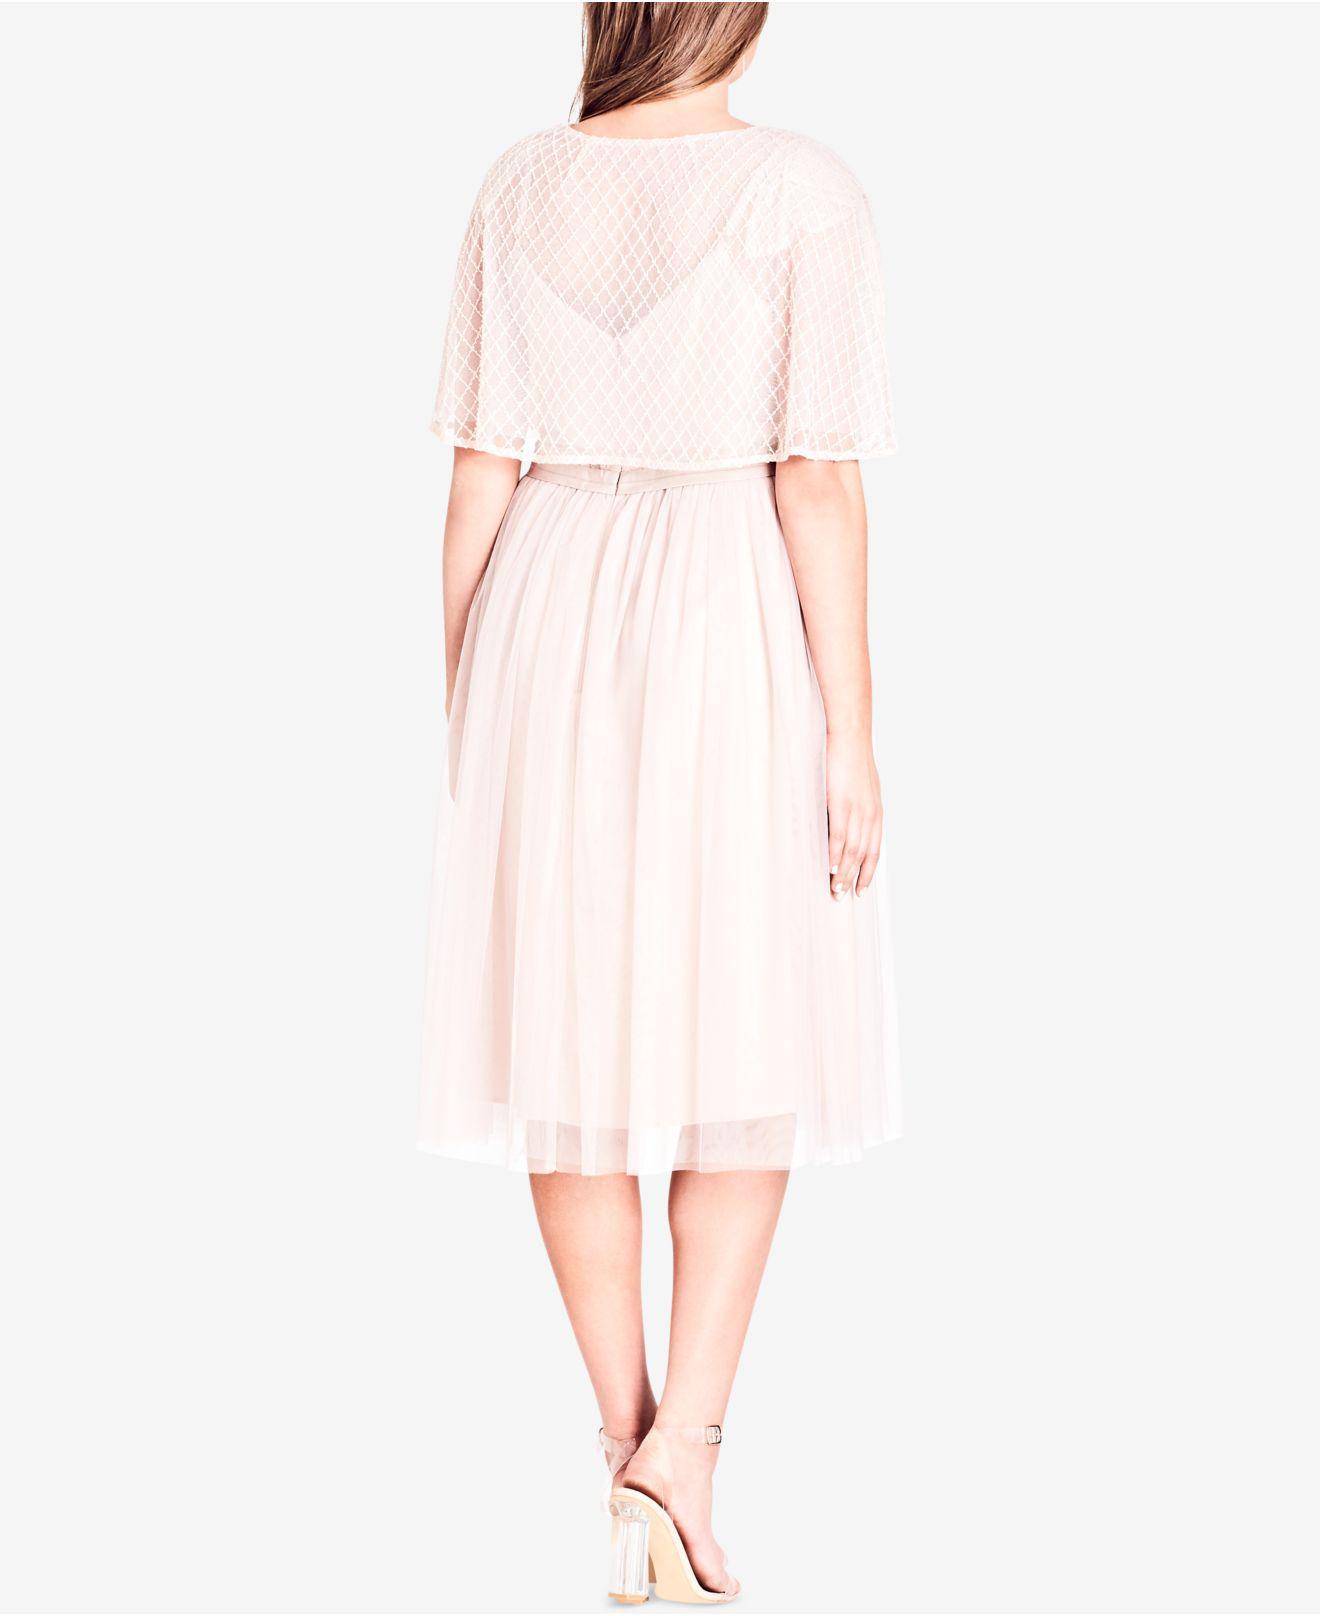 d869fb66d3da7 Lyst - City Chic Trendy Plus Size Sheer Cape Cardigan in Pink